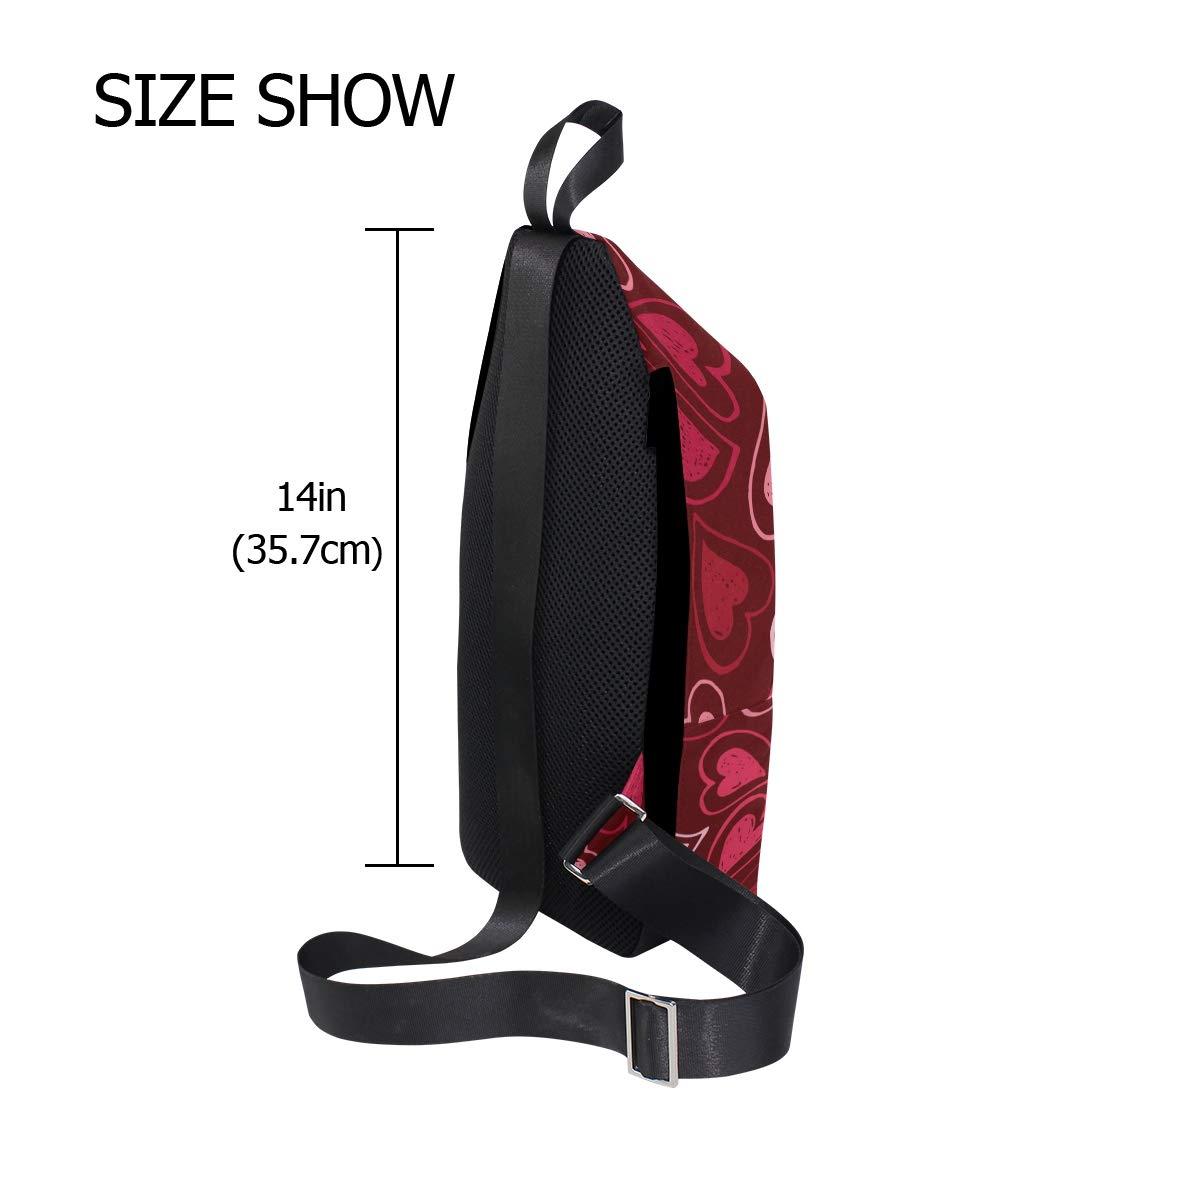 AHOMY And Red Love Heart Messenger Bag Small Travel School Sling Bag Crossbody Bag